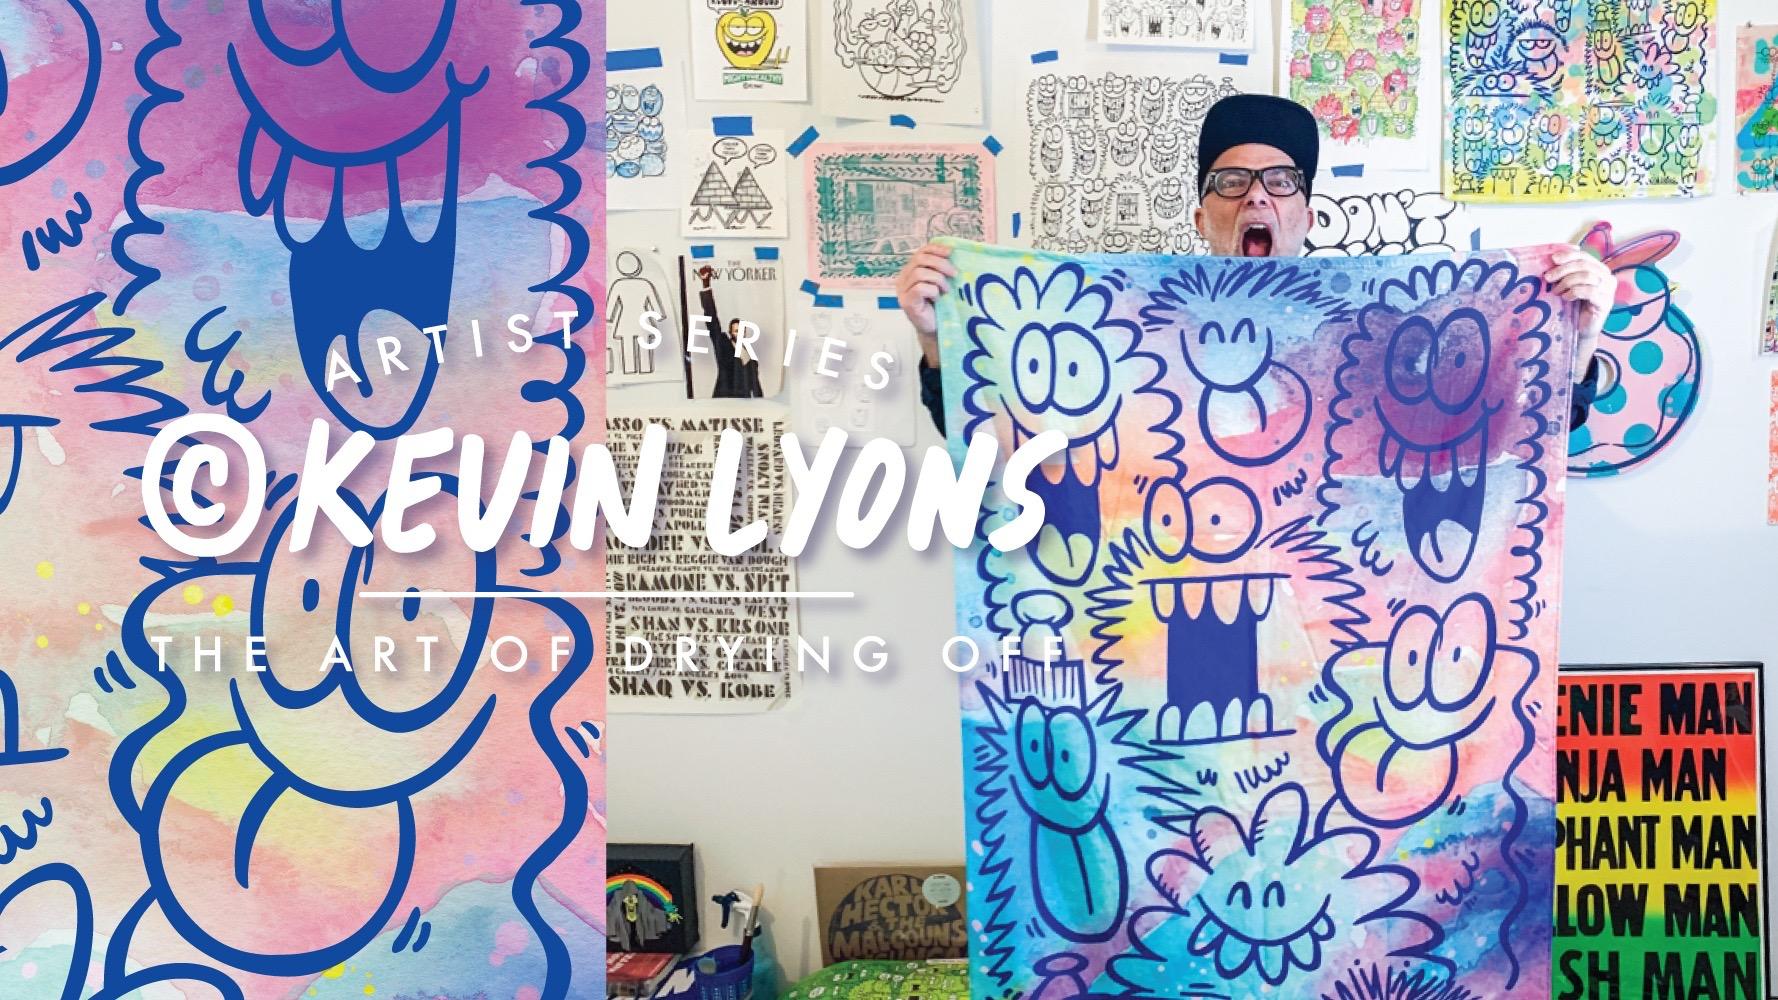 KEVIN LYONS HERO